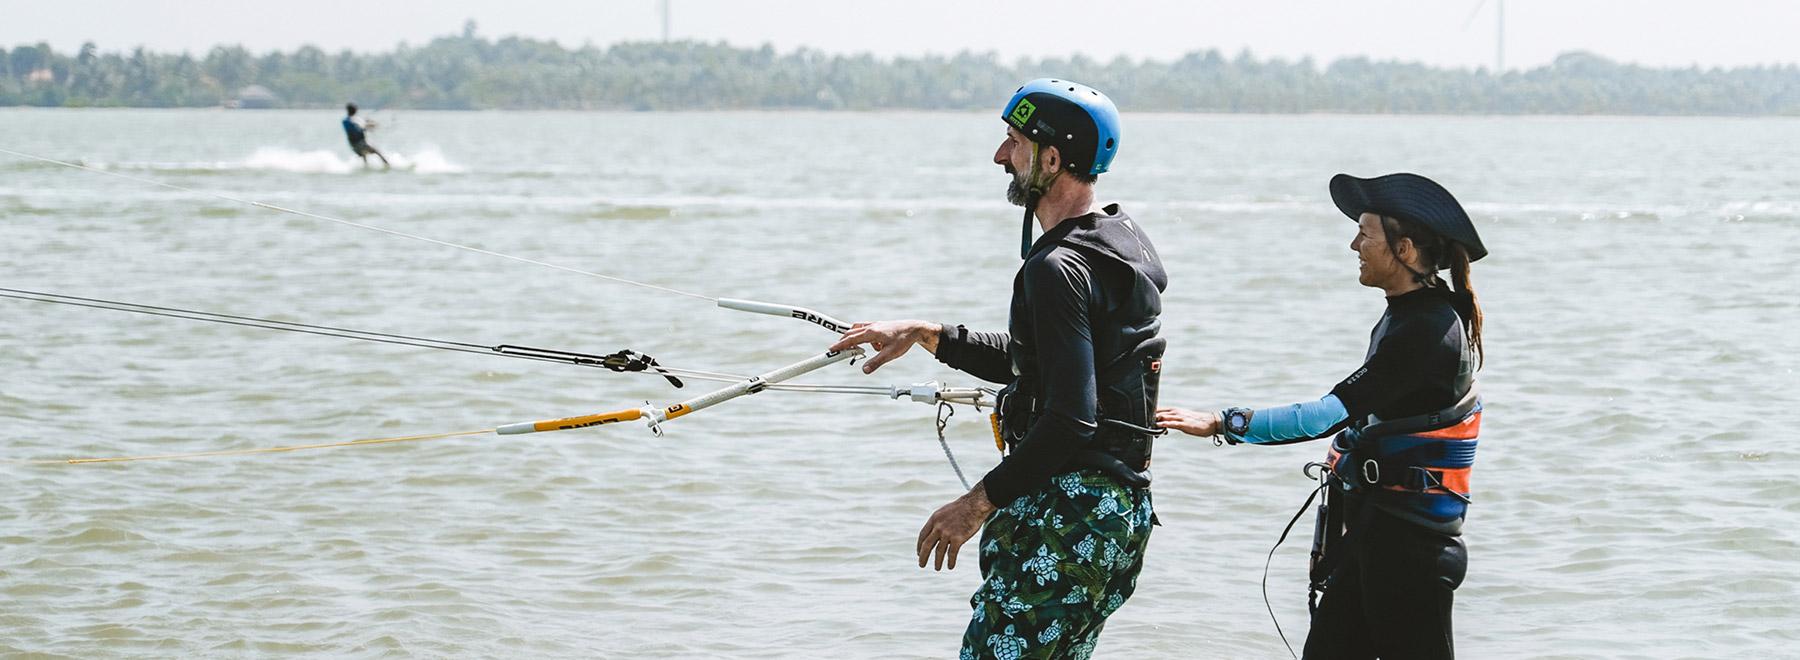 Kitesurfen lernen in Kalpitiya, Sri Lanka